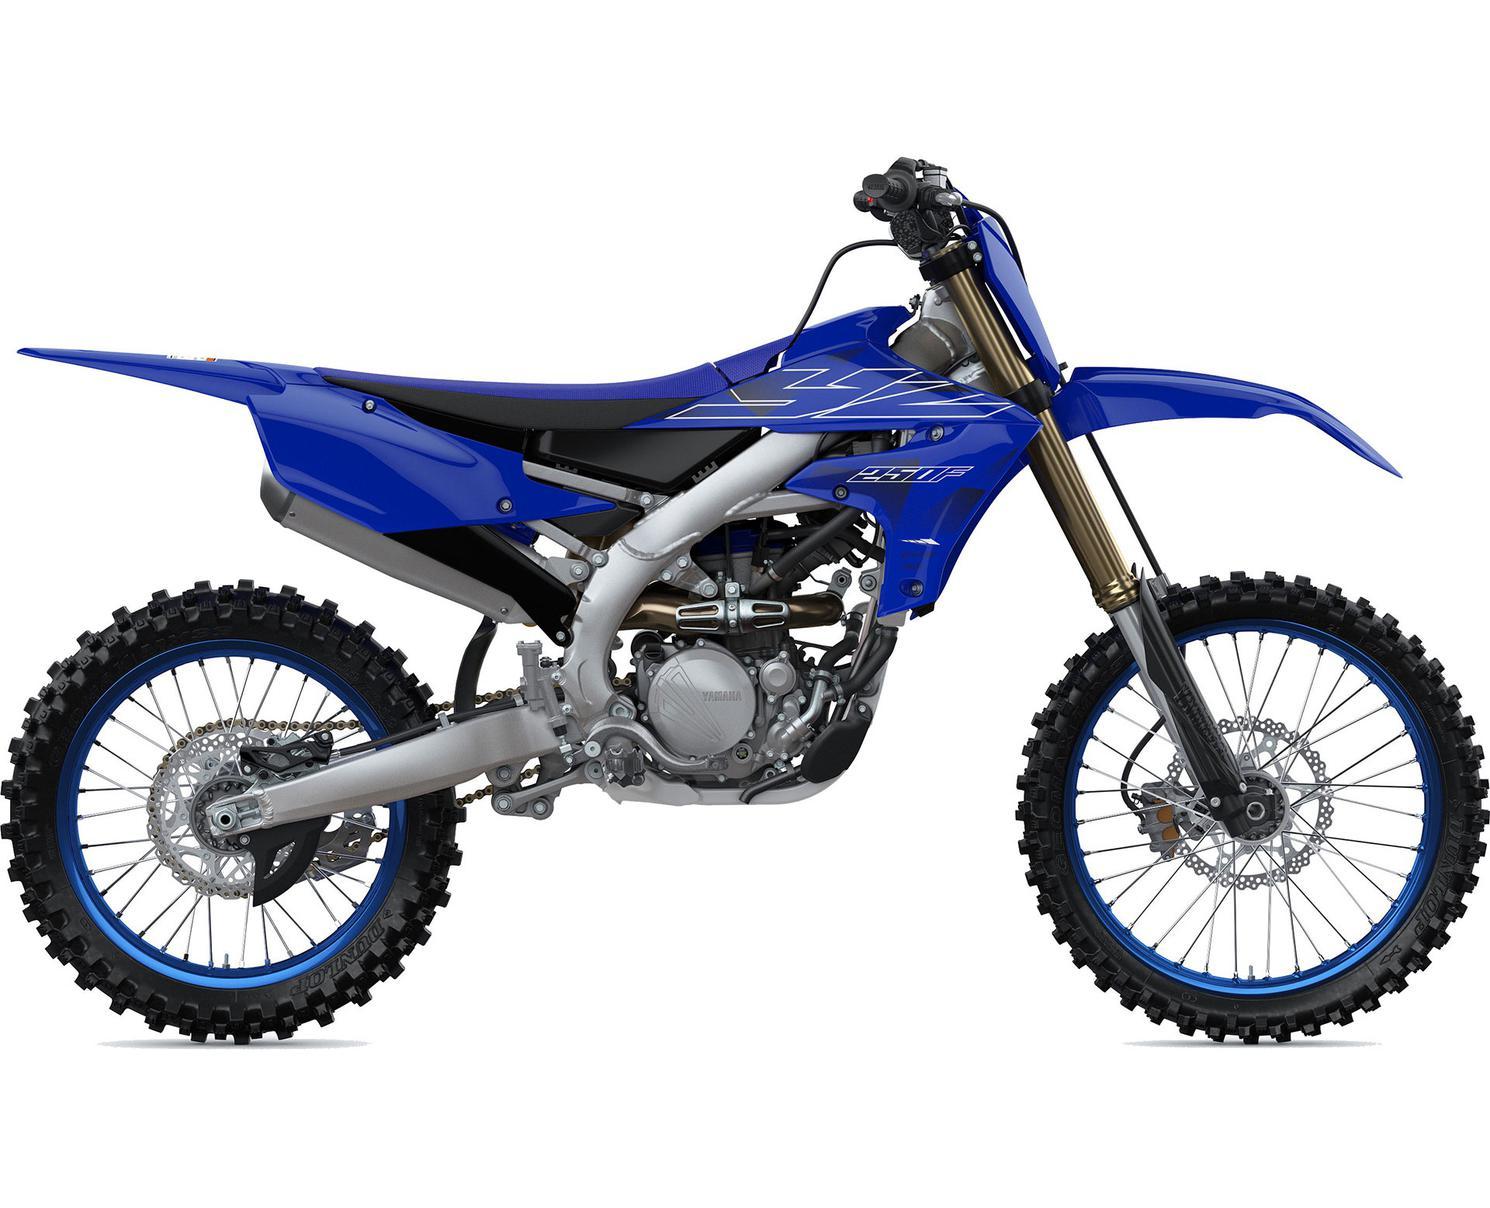 2022 Yamaha YZ250F Team Yamaha Blue